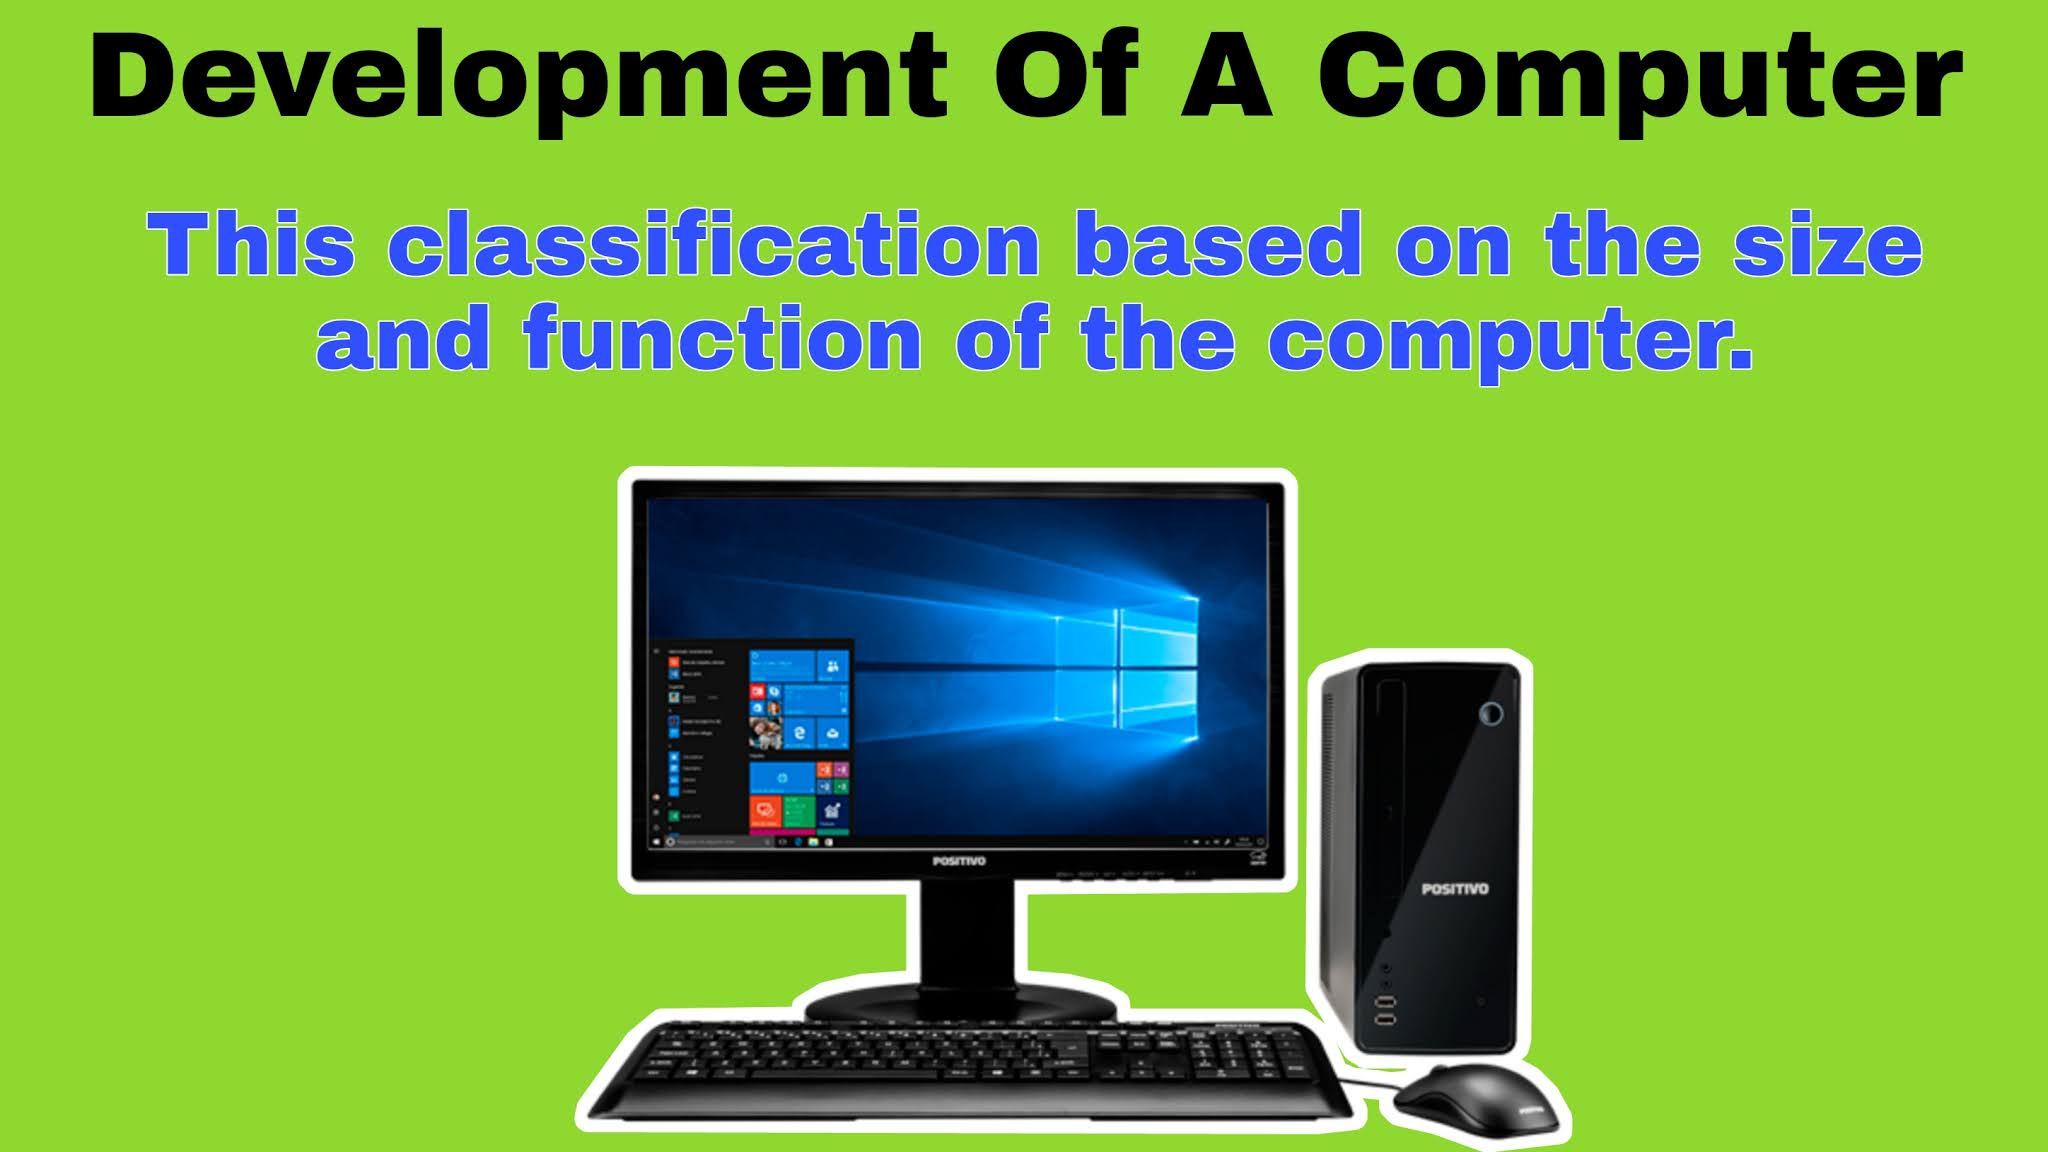 आकर और कार्य के आधार पर कम्प्यूटर के विकास का वर्गीकरण ( Classification of computer development based on computer size and function )